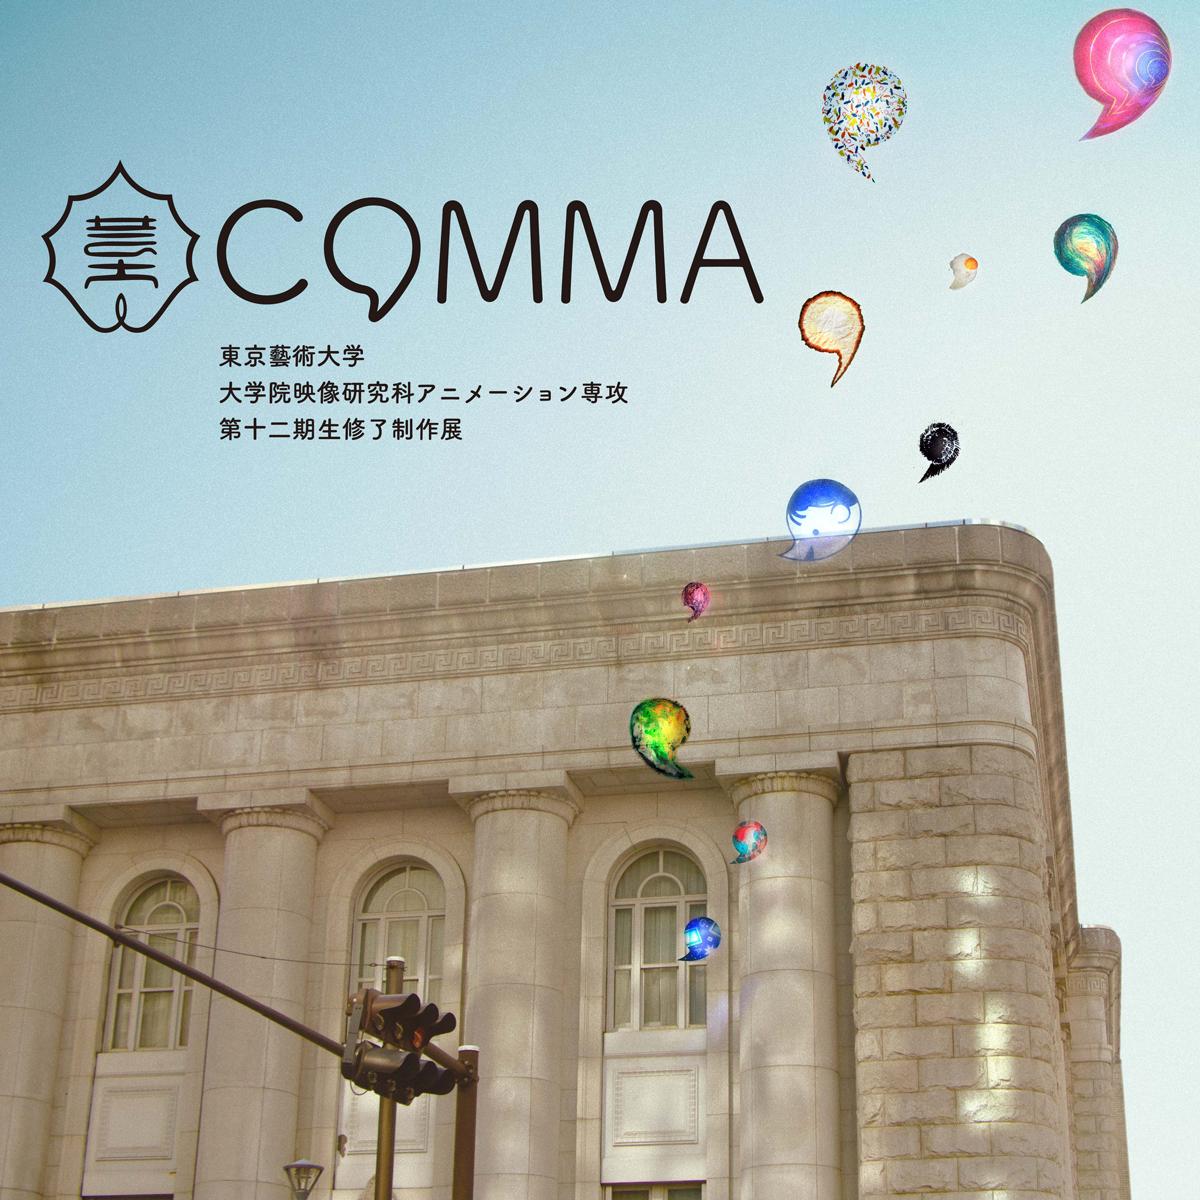 東京藝術大学大学院映像研究科アニメーション専攻 第十二期生修了制作展 12COMMA GEIDAI ANIMATION